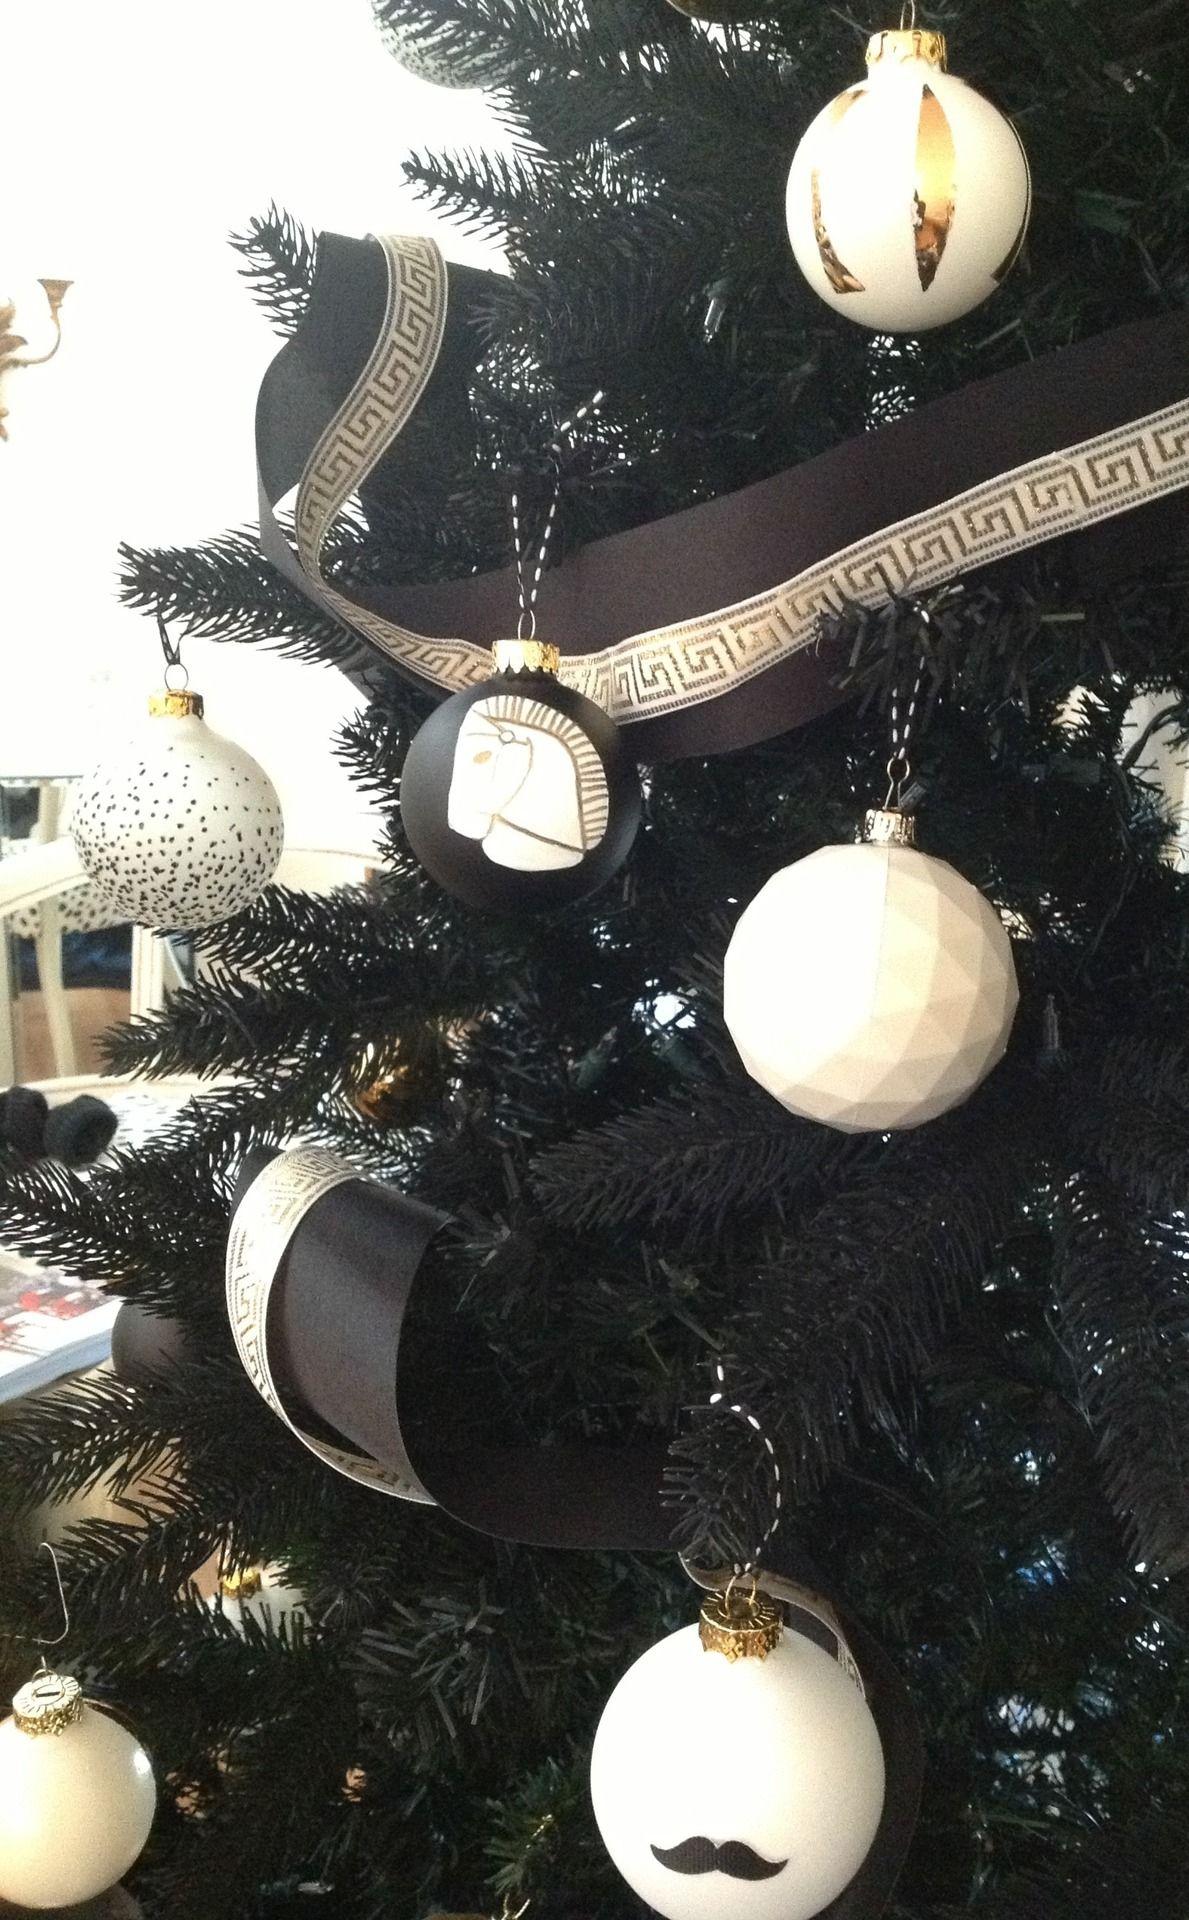 Diy Christmas Ornaments On A Black Tree Black Christmas Decorations Black White And Gold Christmas White Xmas Tree